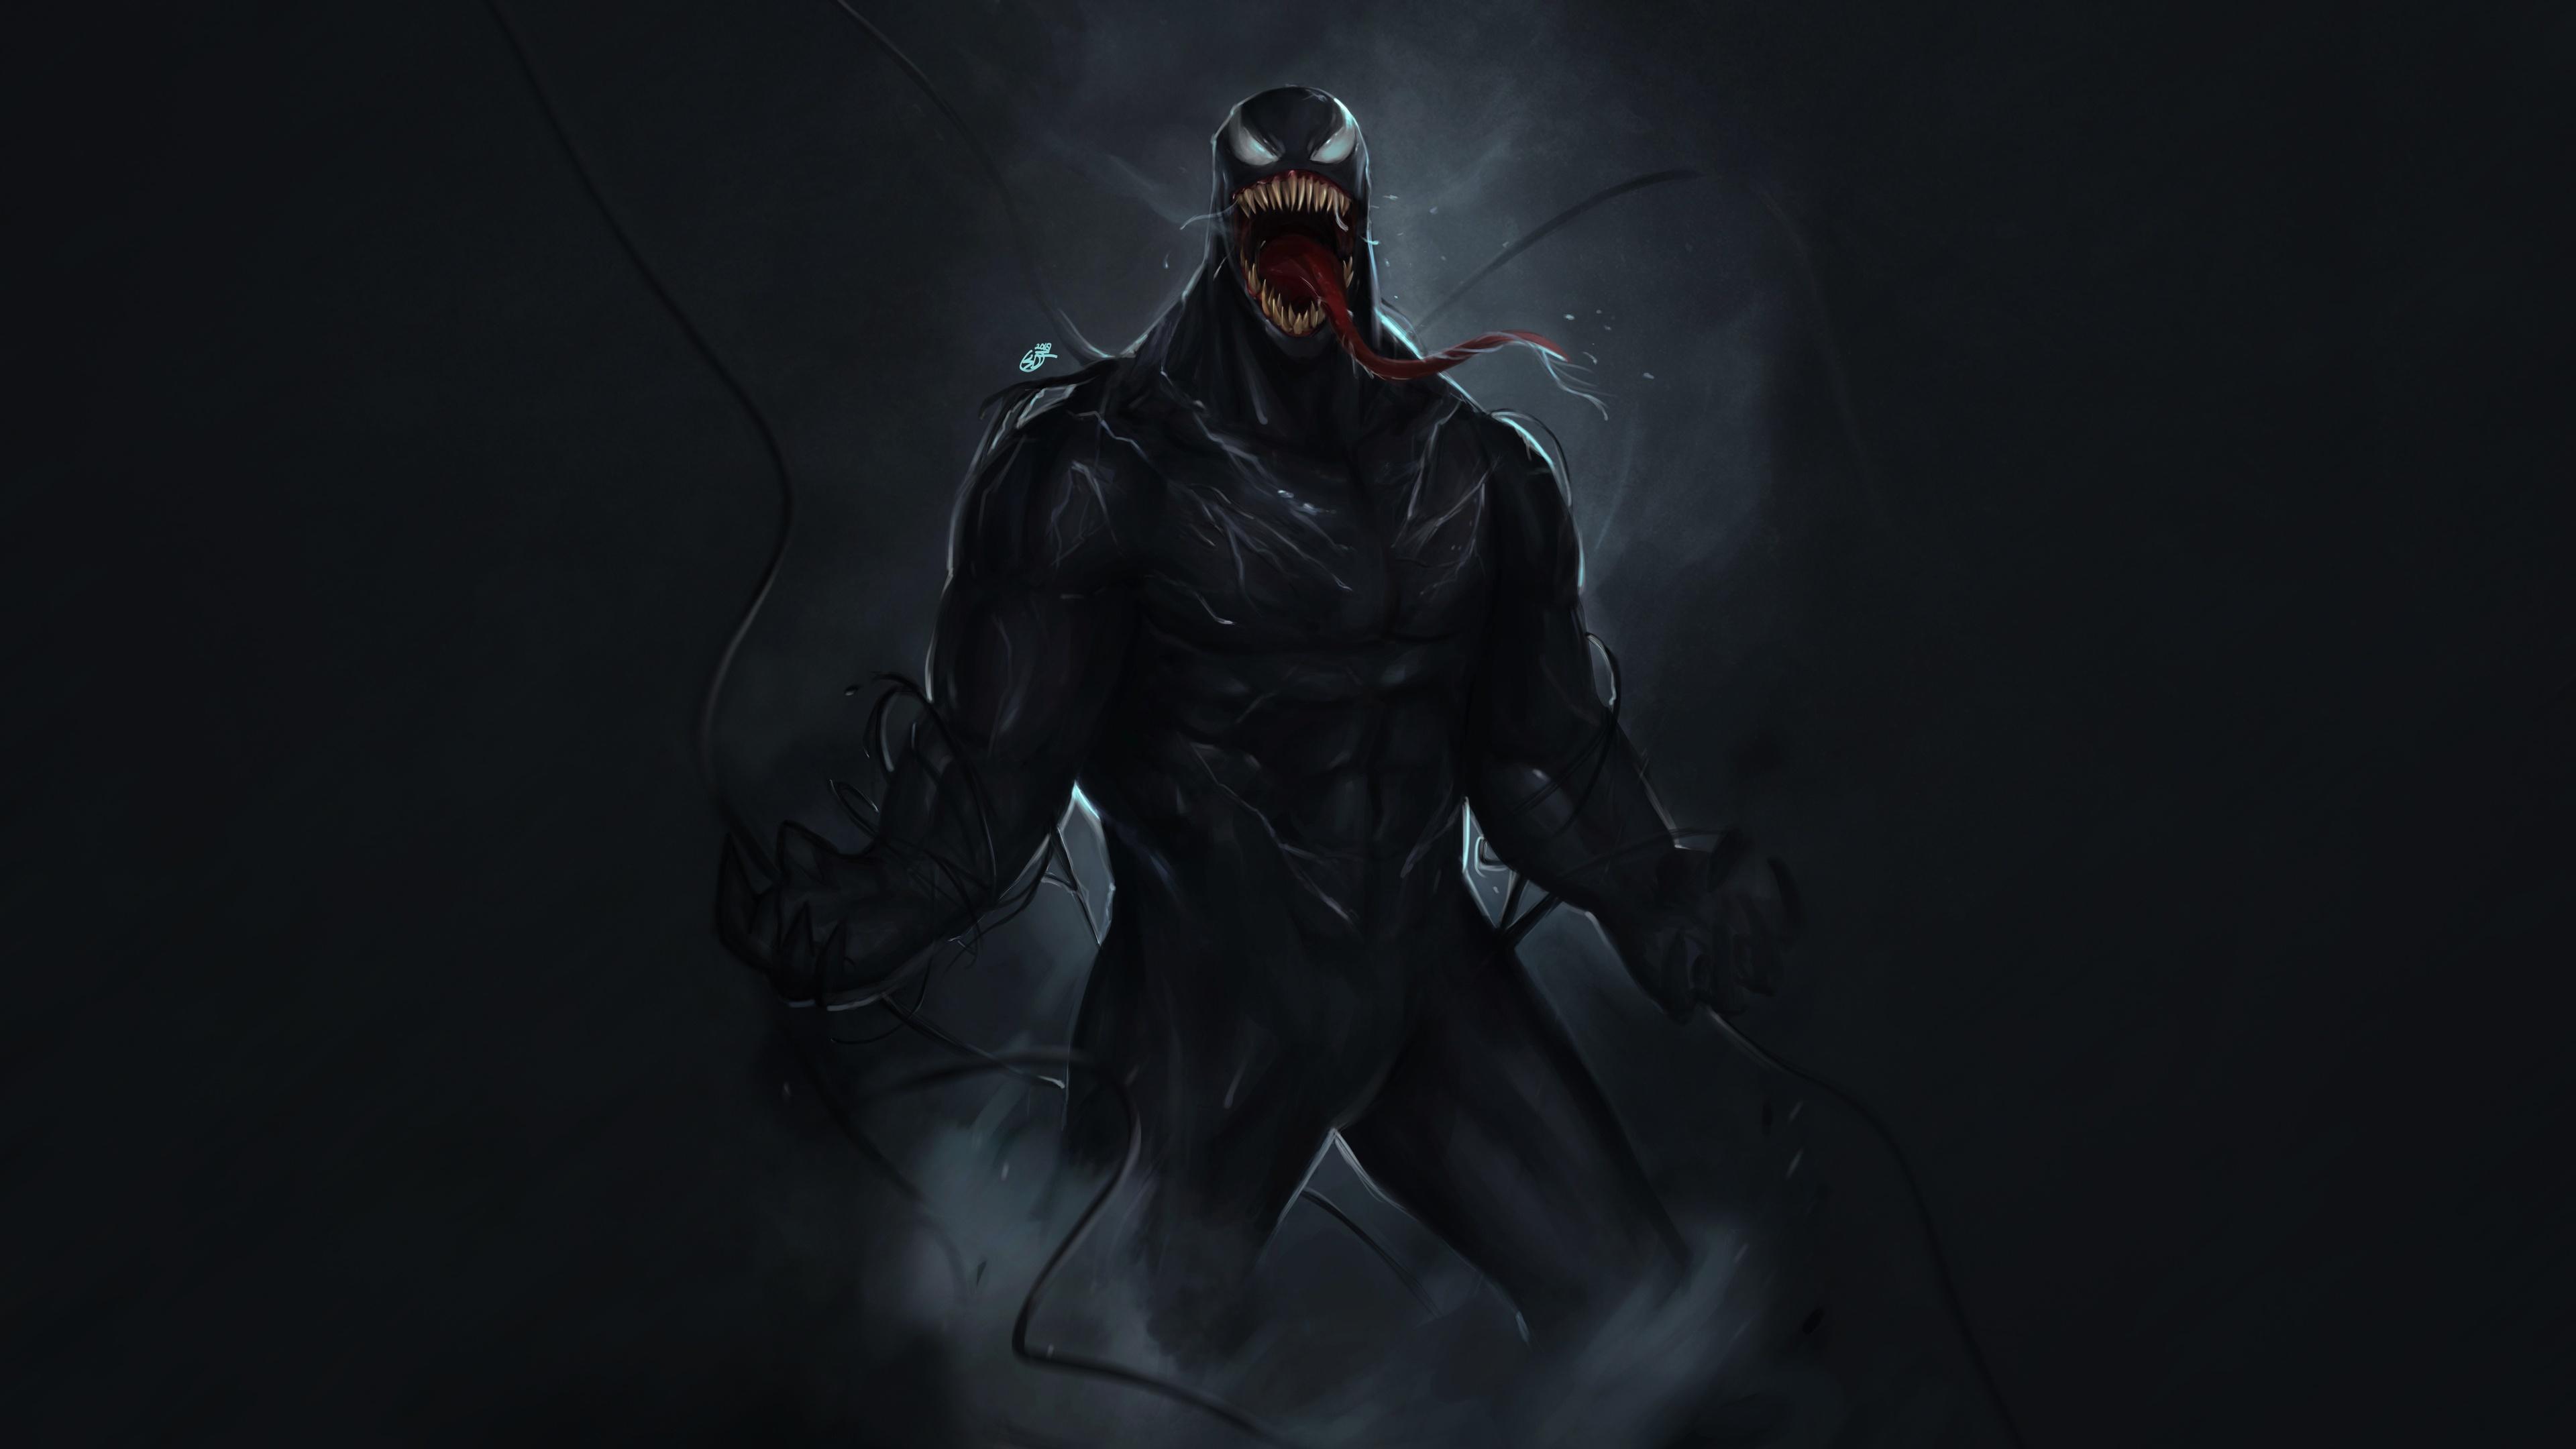 2048x2048 Venom 2018 Movie 4k Ipad Air Hd 4k Wallpapers: Venom Marvel Comic Superhero 4k Venom Wallpapers